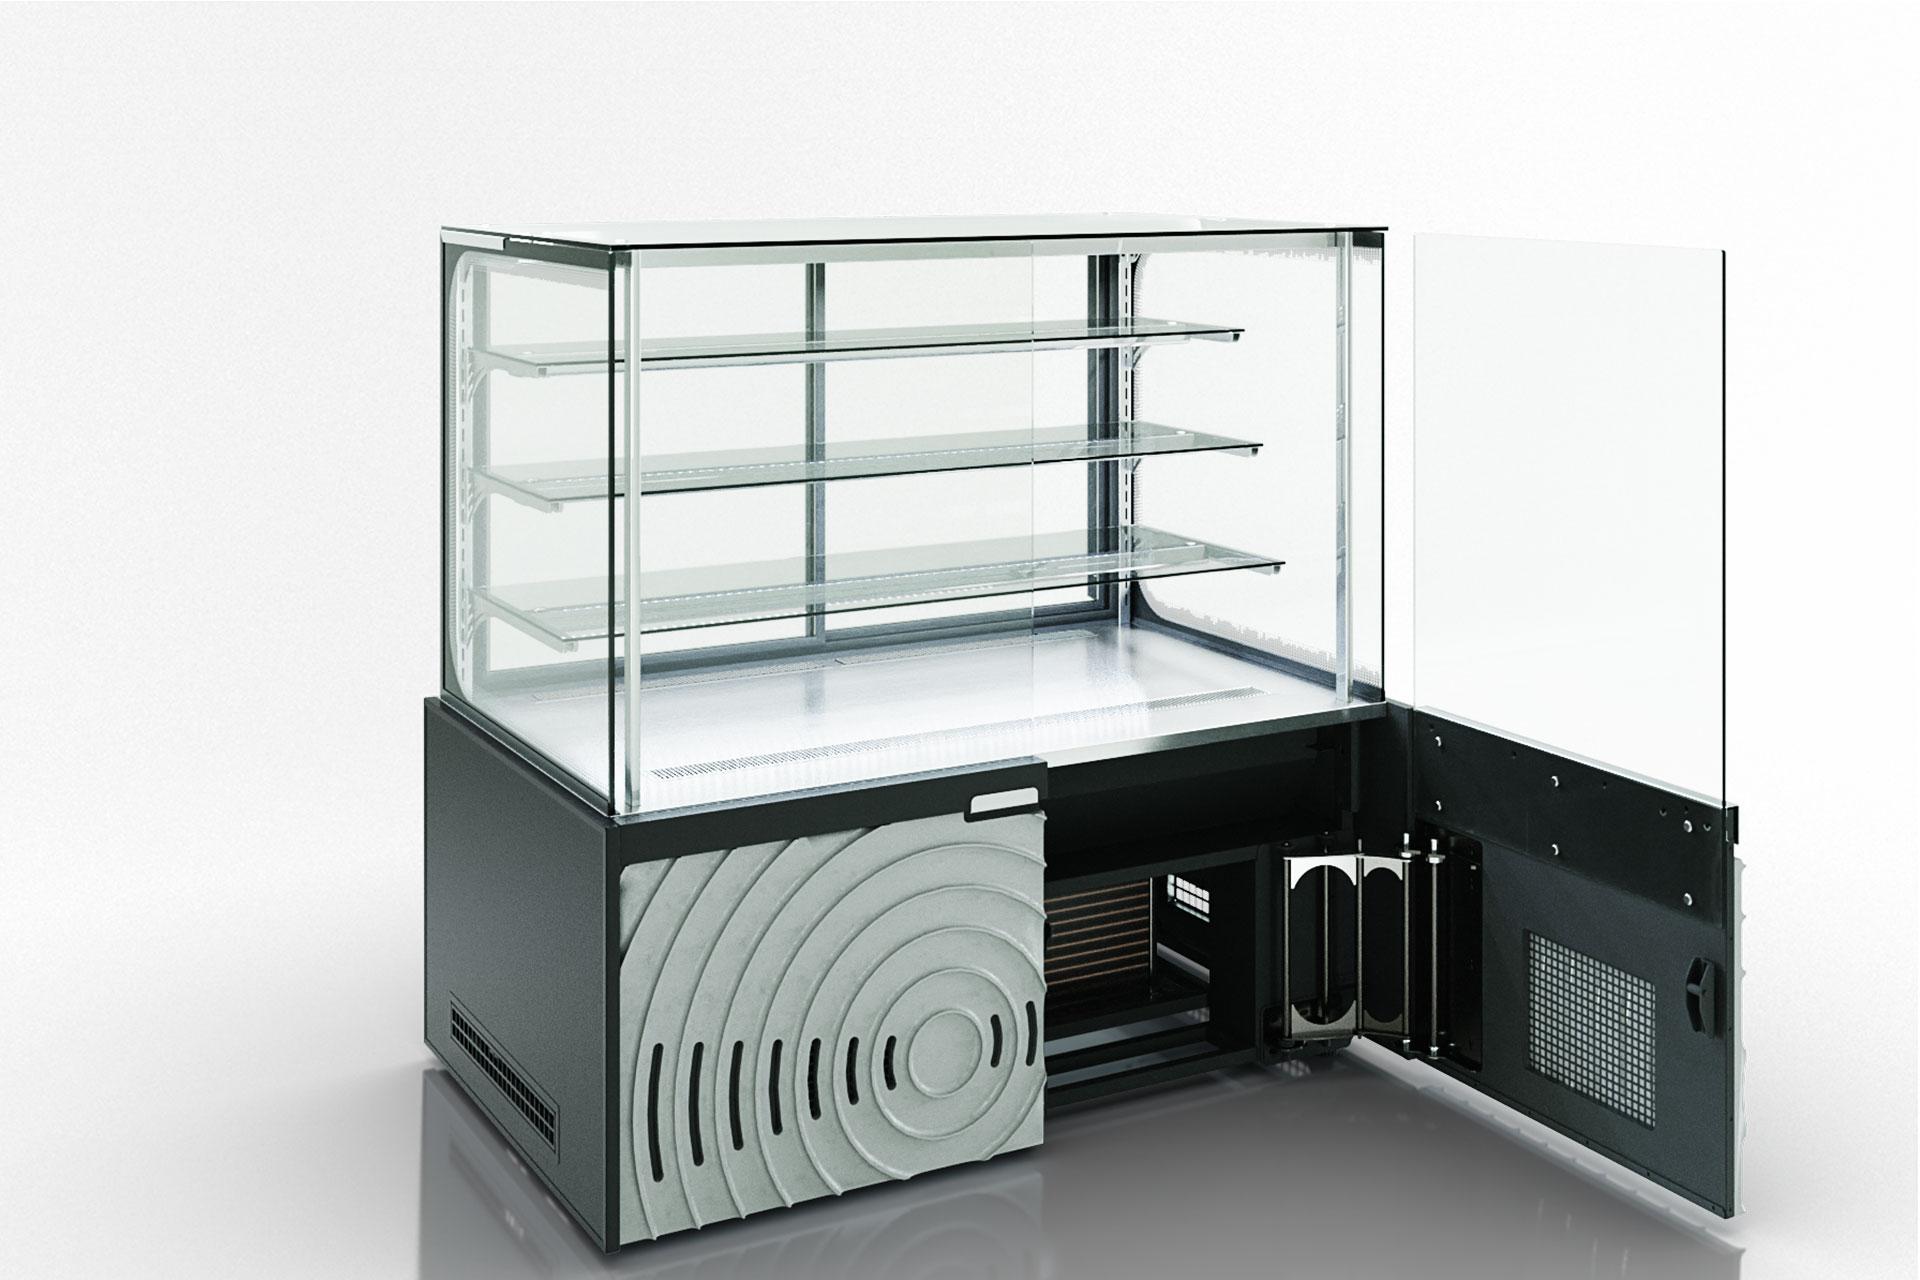 Confectionery counter Dakota AC 090 patisserie RS 150-DLA